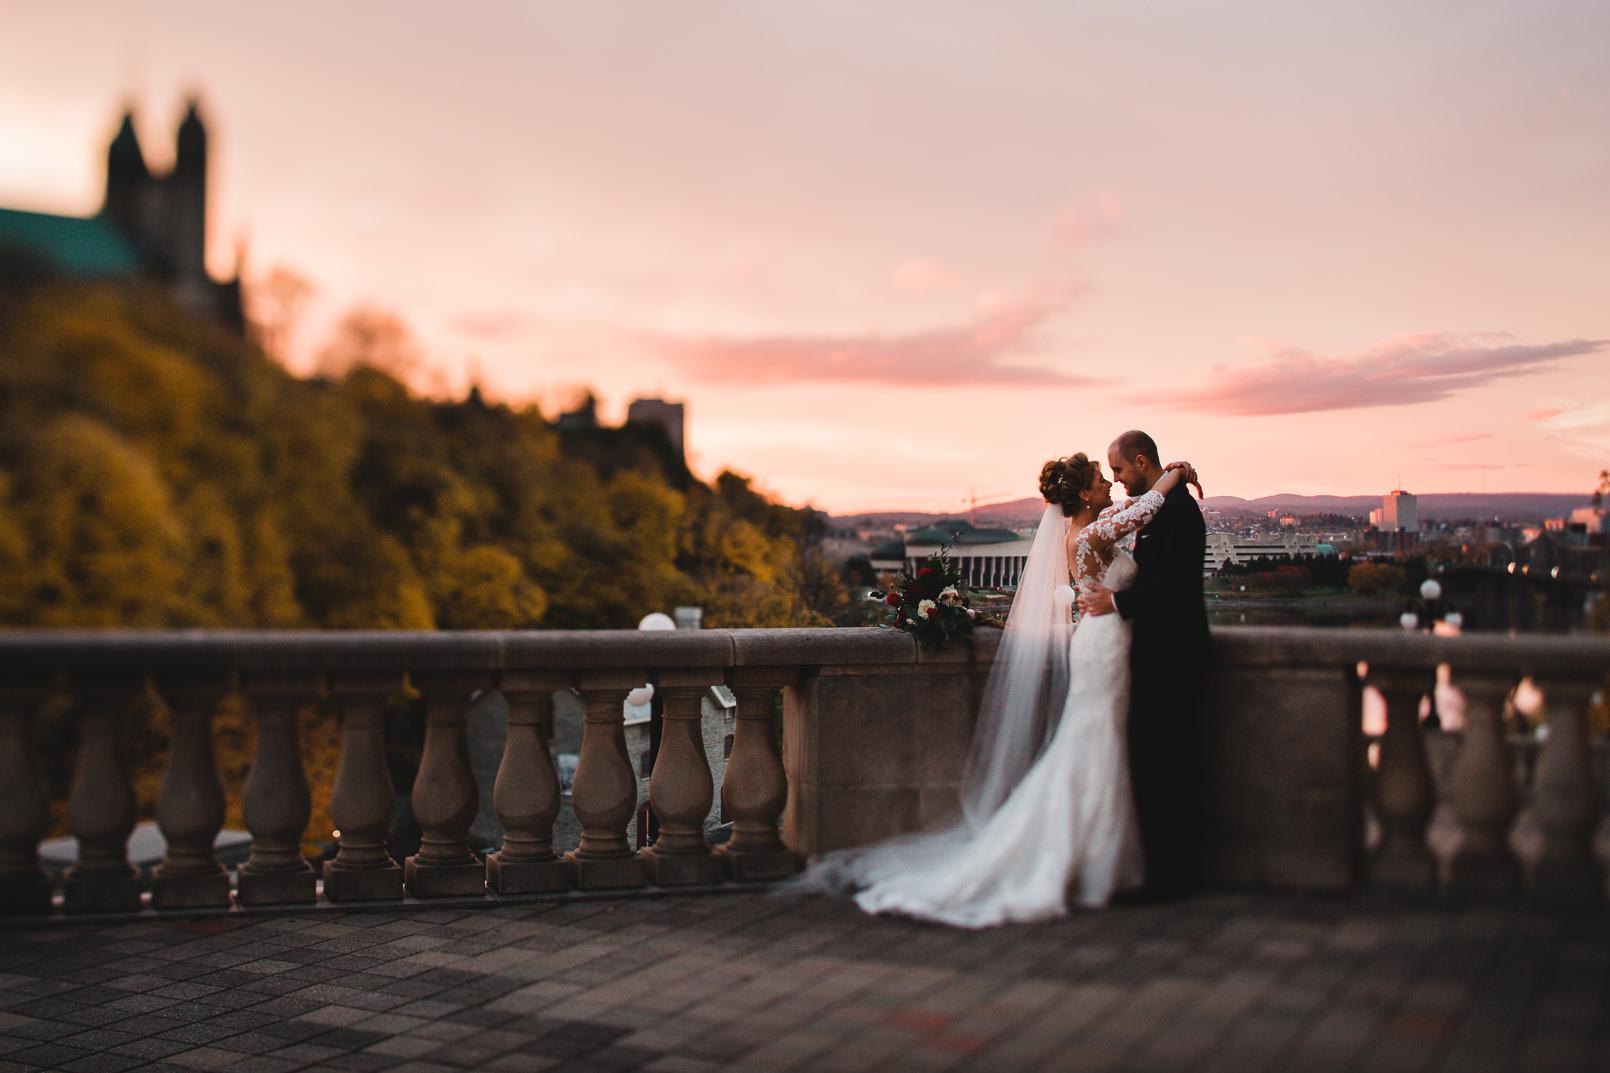 007-Jonathan-Kuhn-Photography-Wedding-_mini.jpg